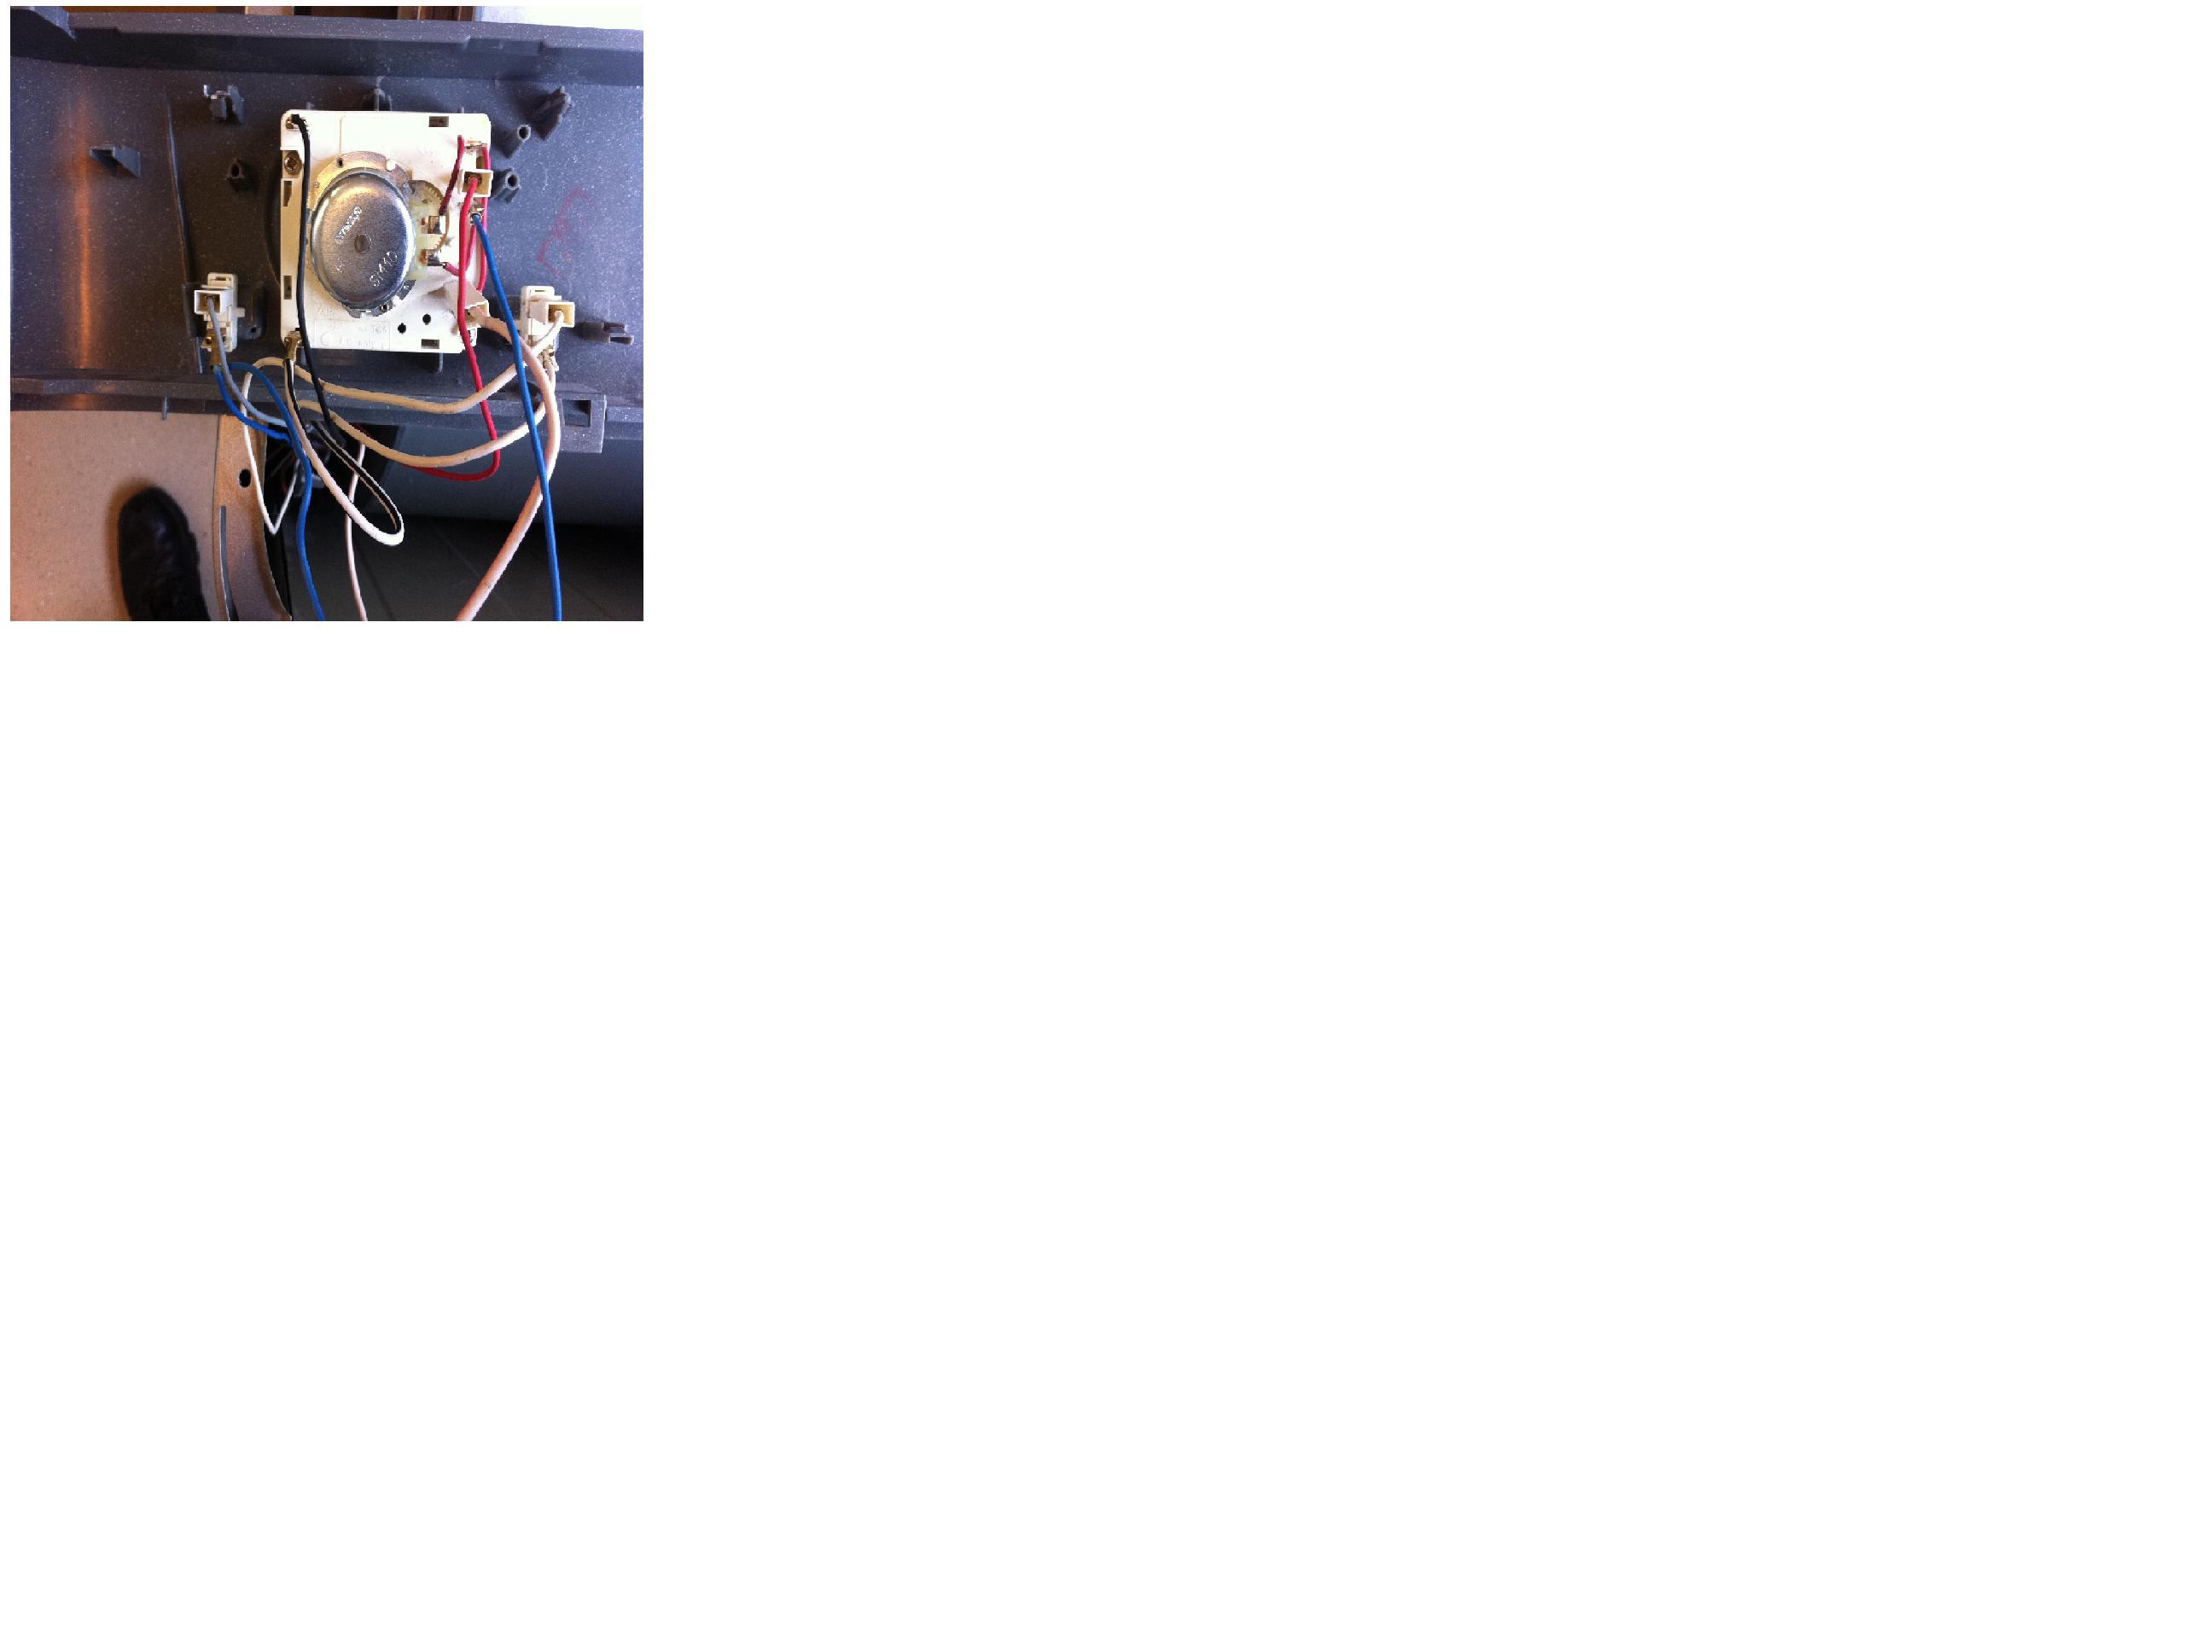 ge hotpoint refrigerator wiring diagram images dryer heating element diagram likewise ge dryer timer wiring diagram